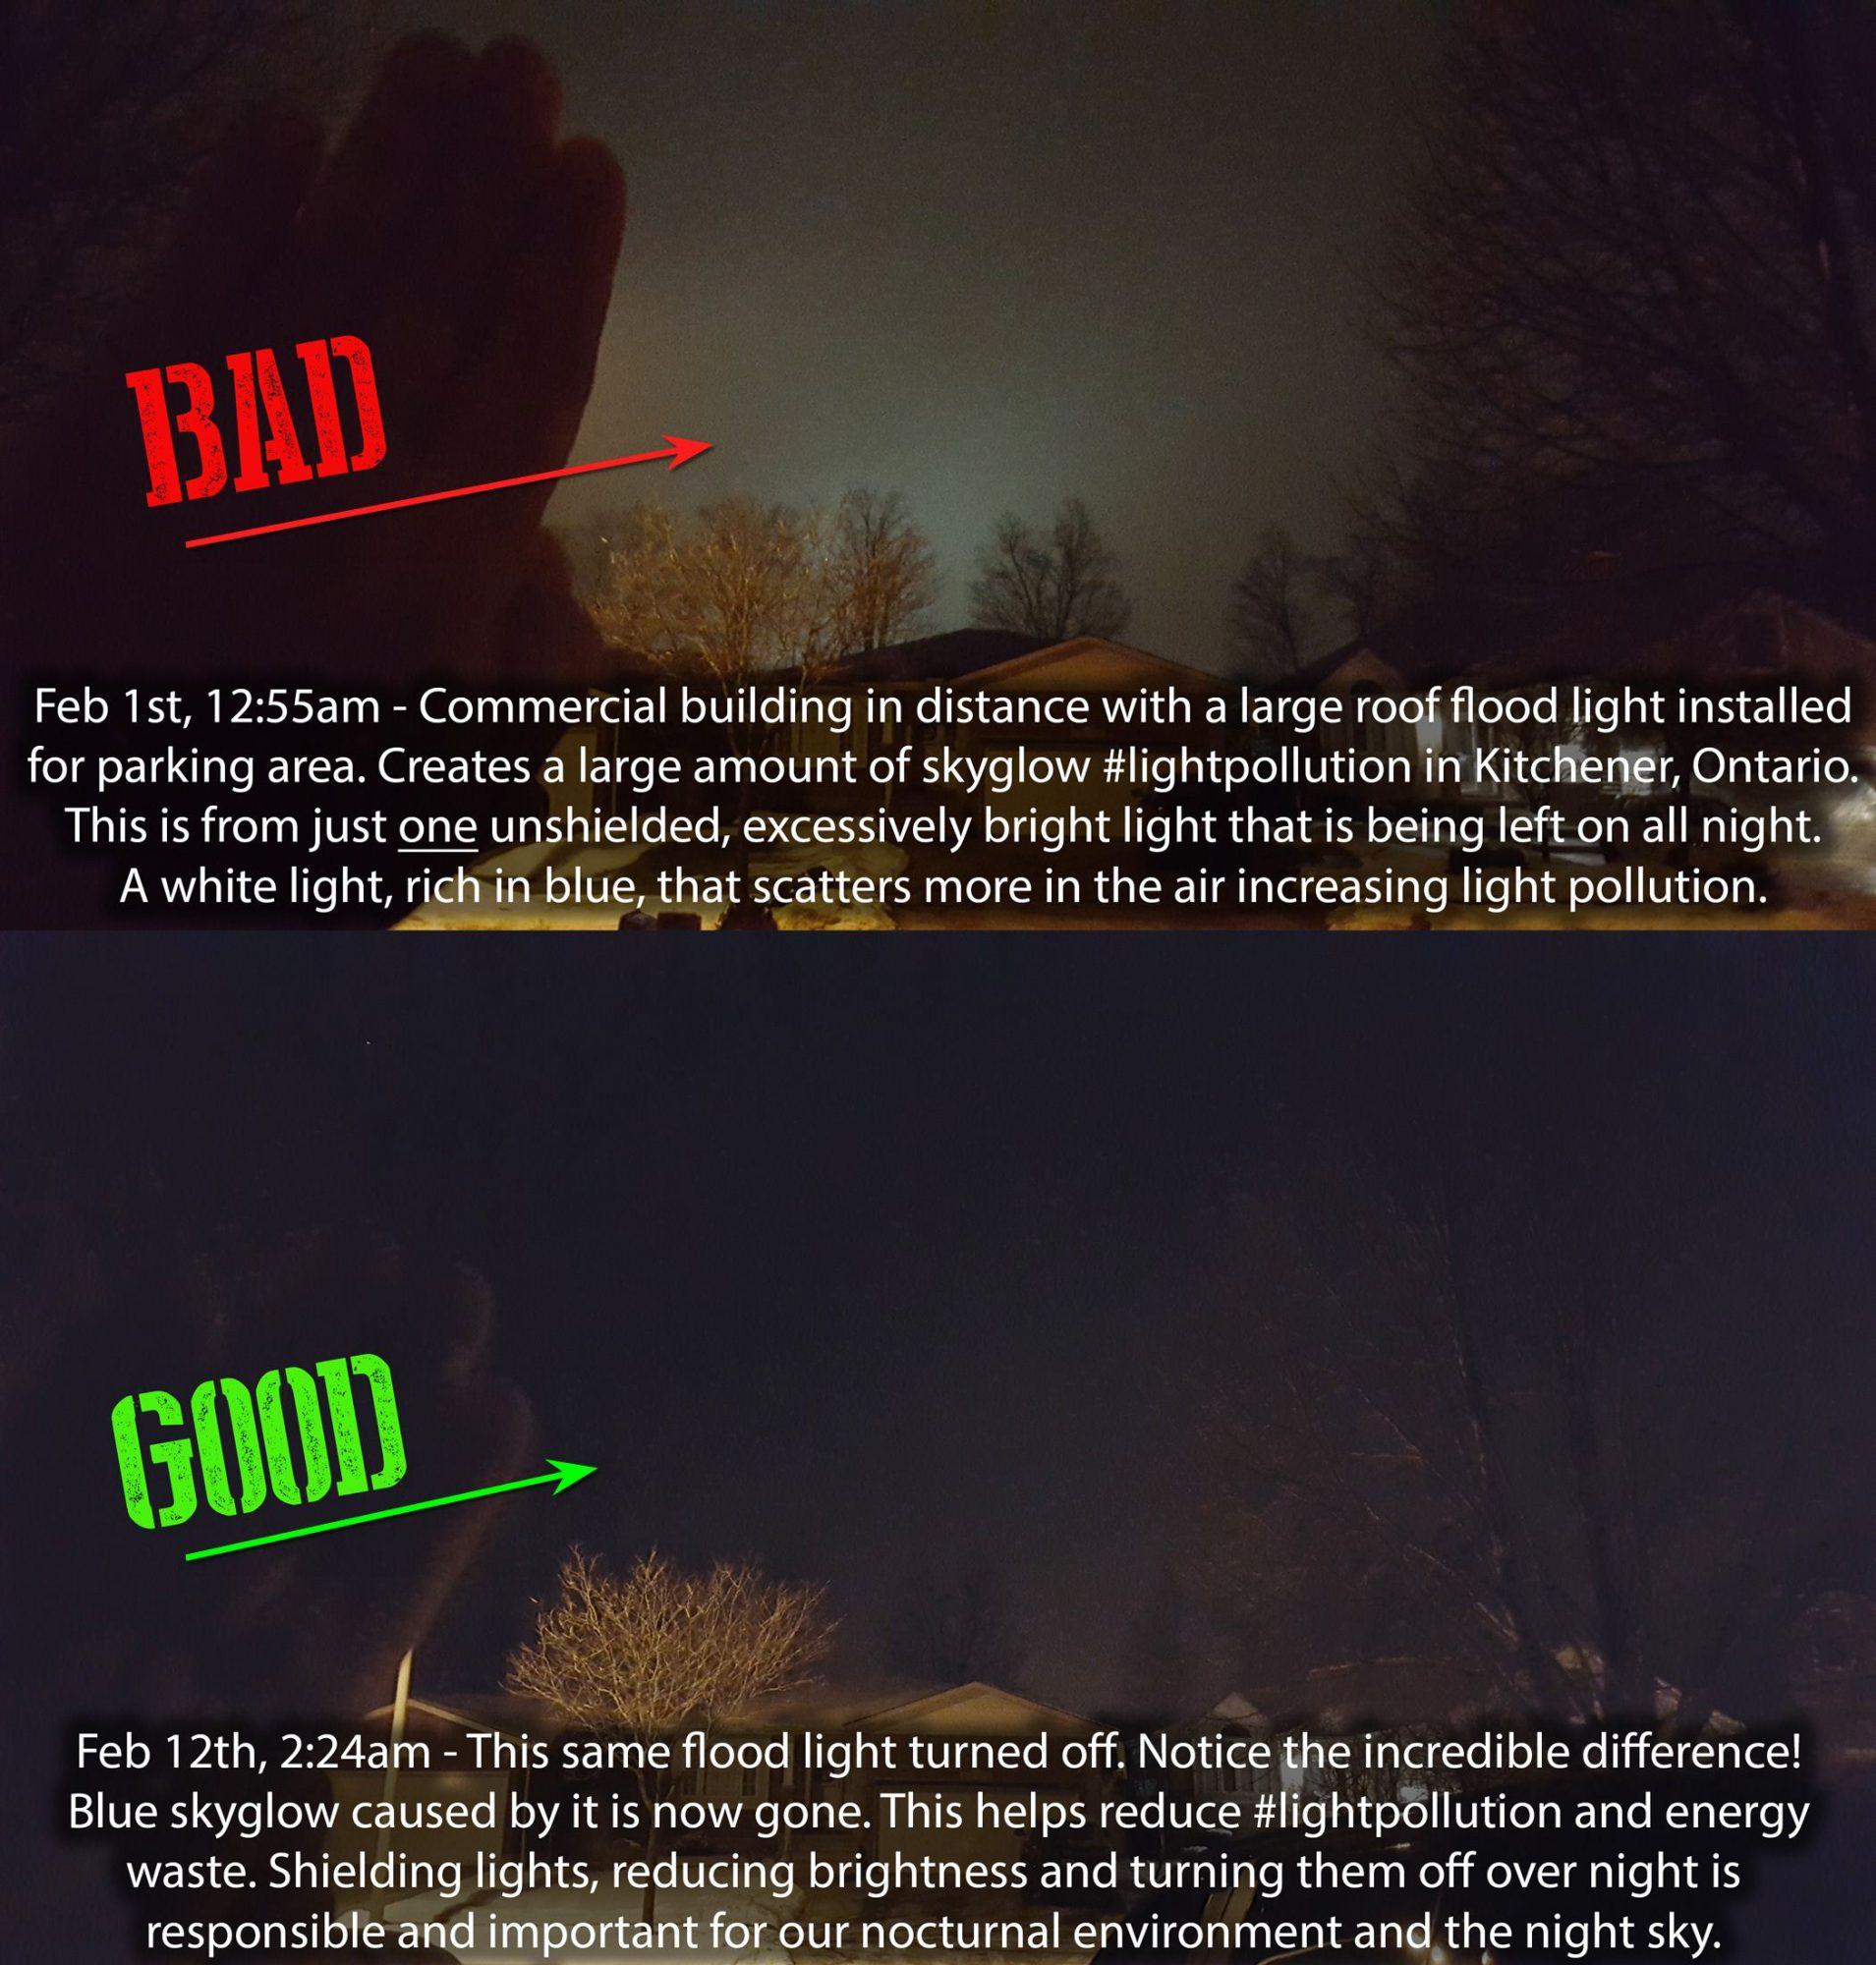 Large flood light illuminates the night sky. Turned on and off photos.